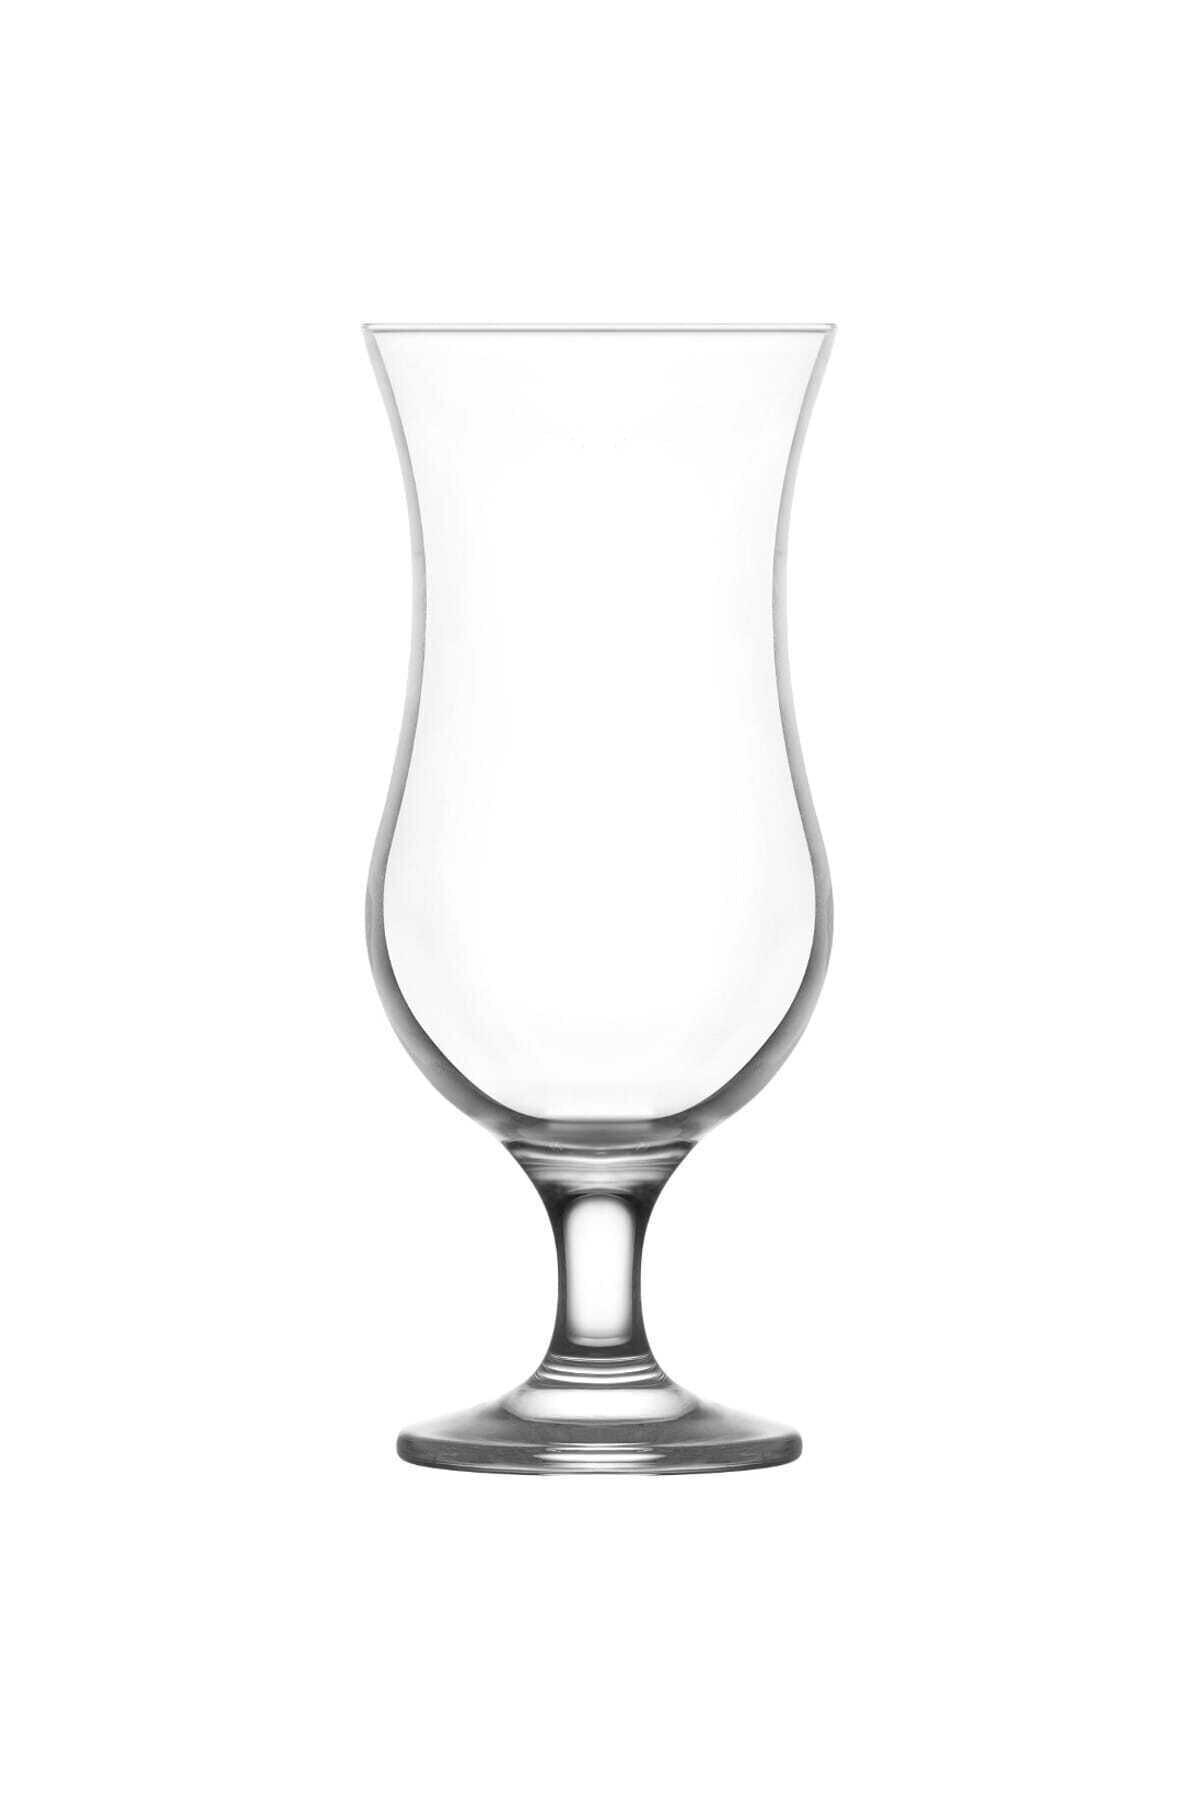 LAV Fiesta 6'lı Kokteyl Bardağı 2